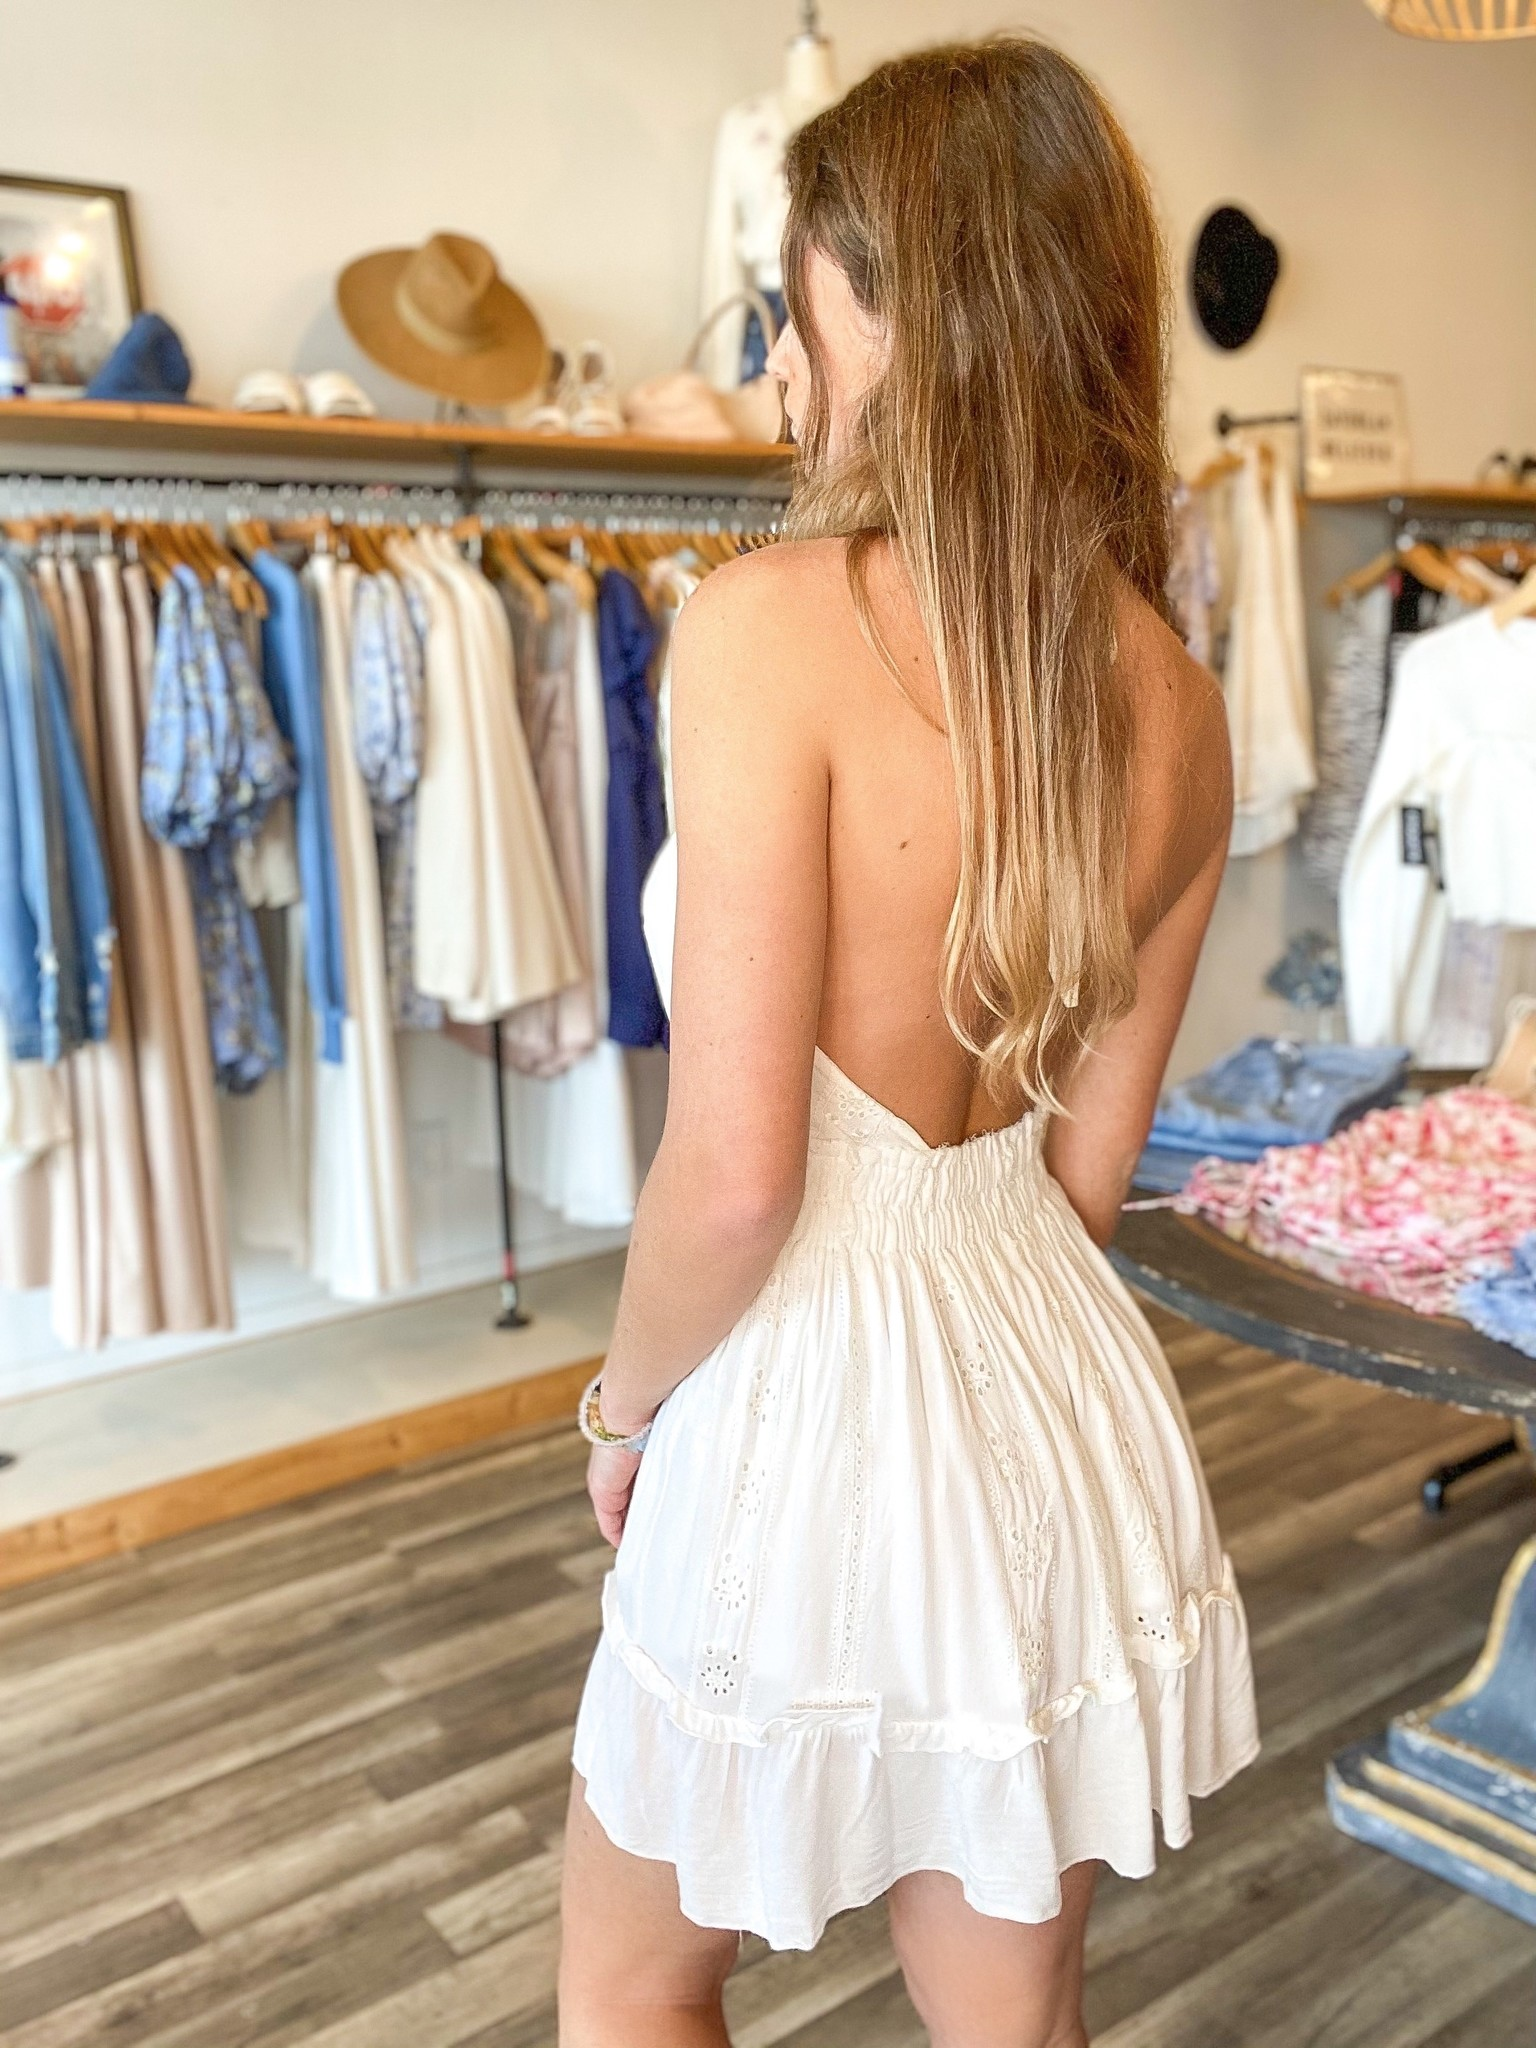 Natalia Halter Dress